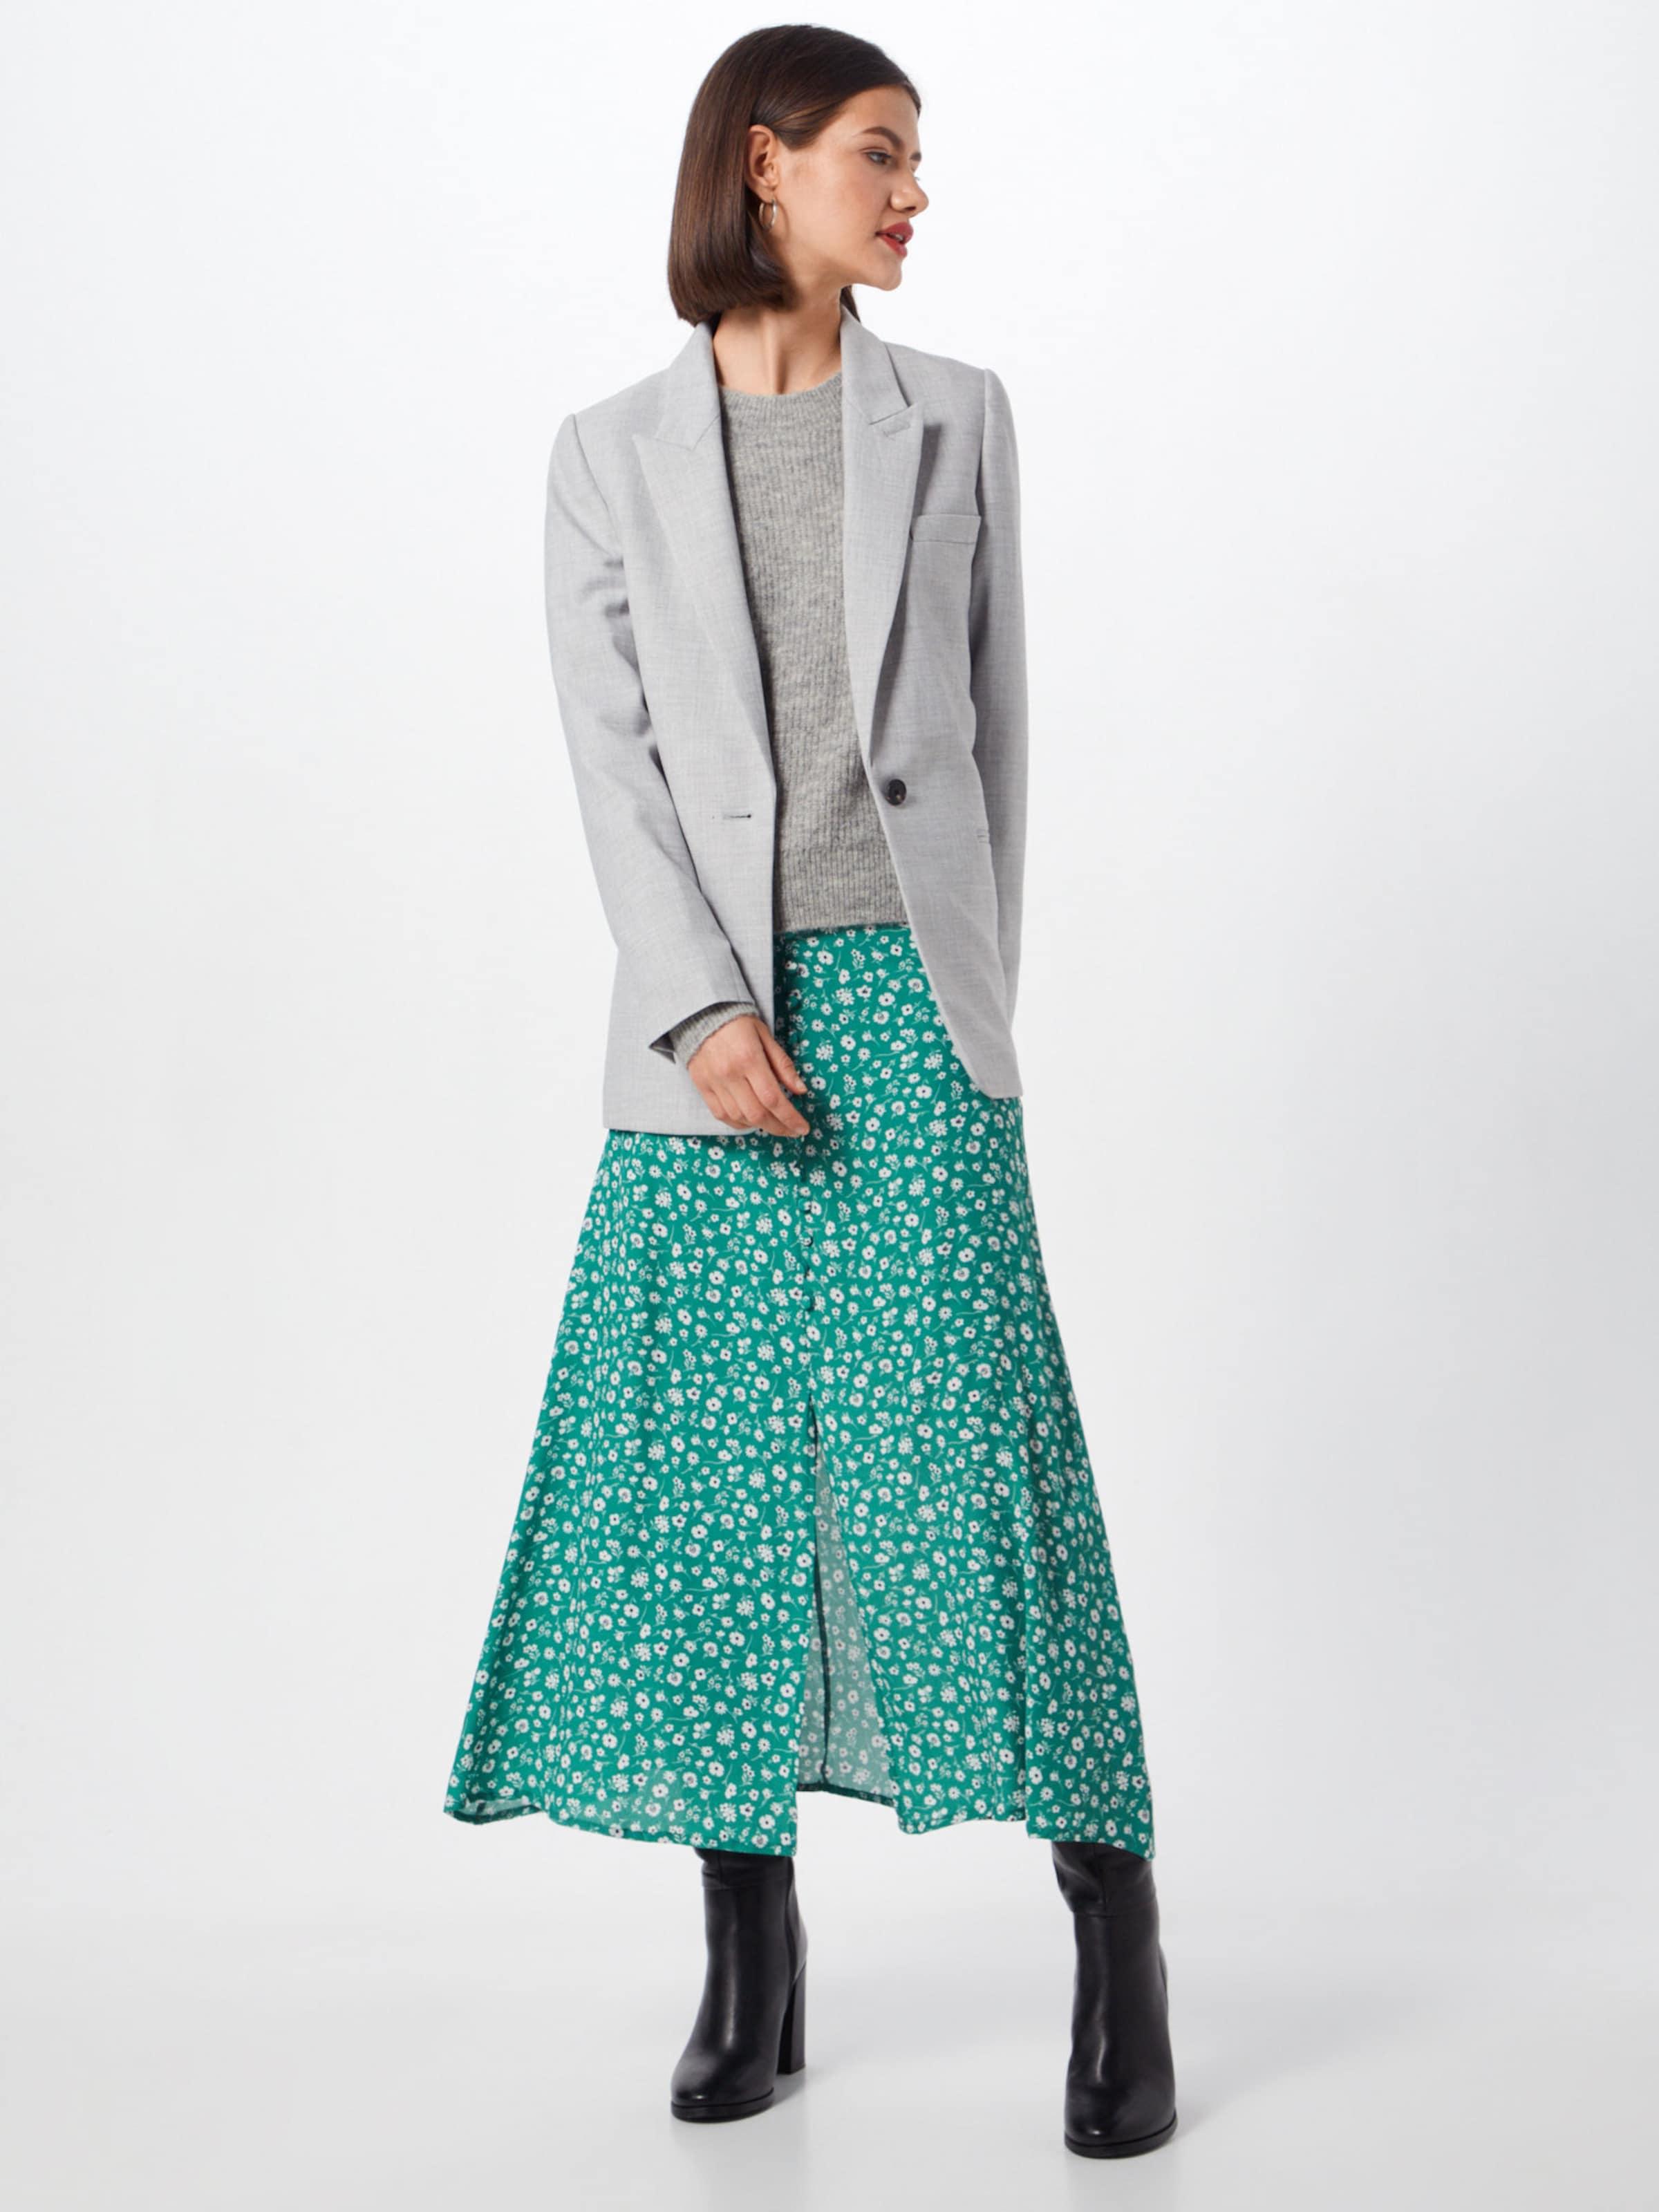 Pullover 'rebelo' In Female Grau Just Tc3uKJlF1